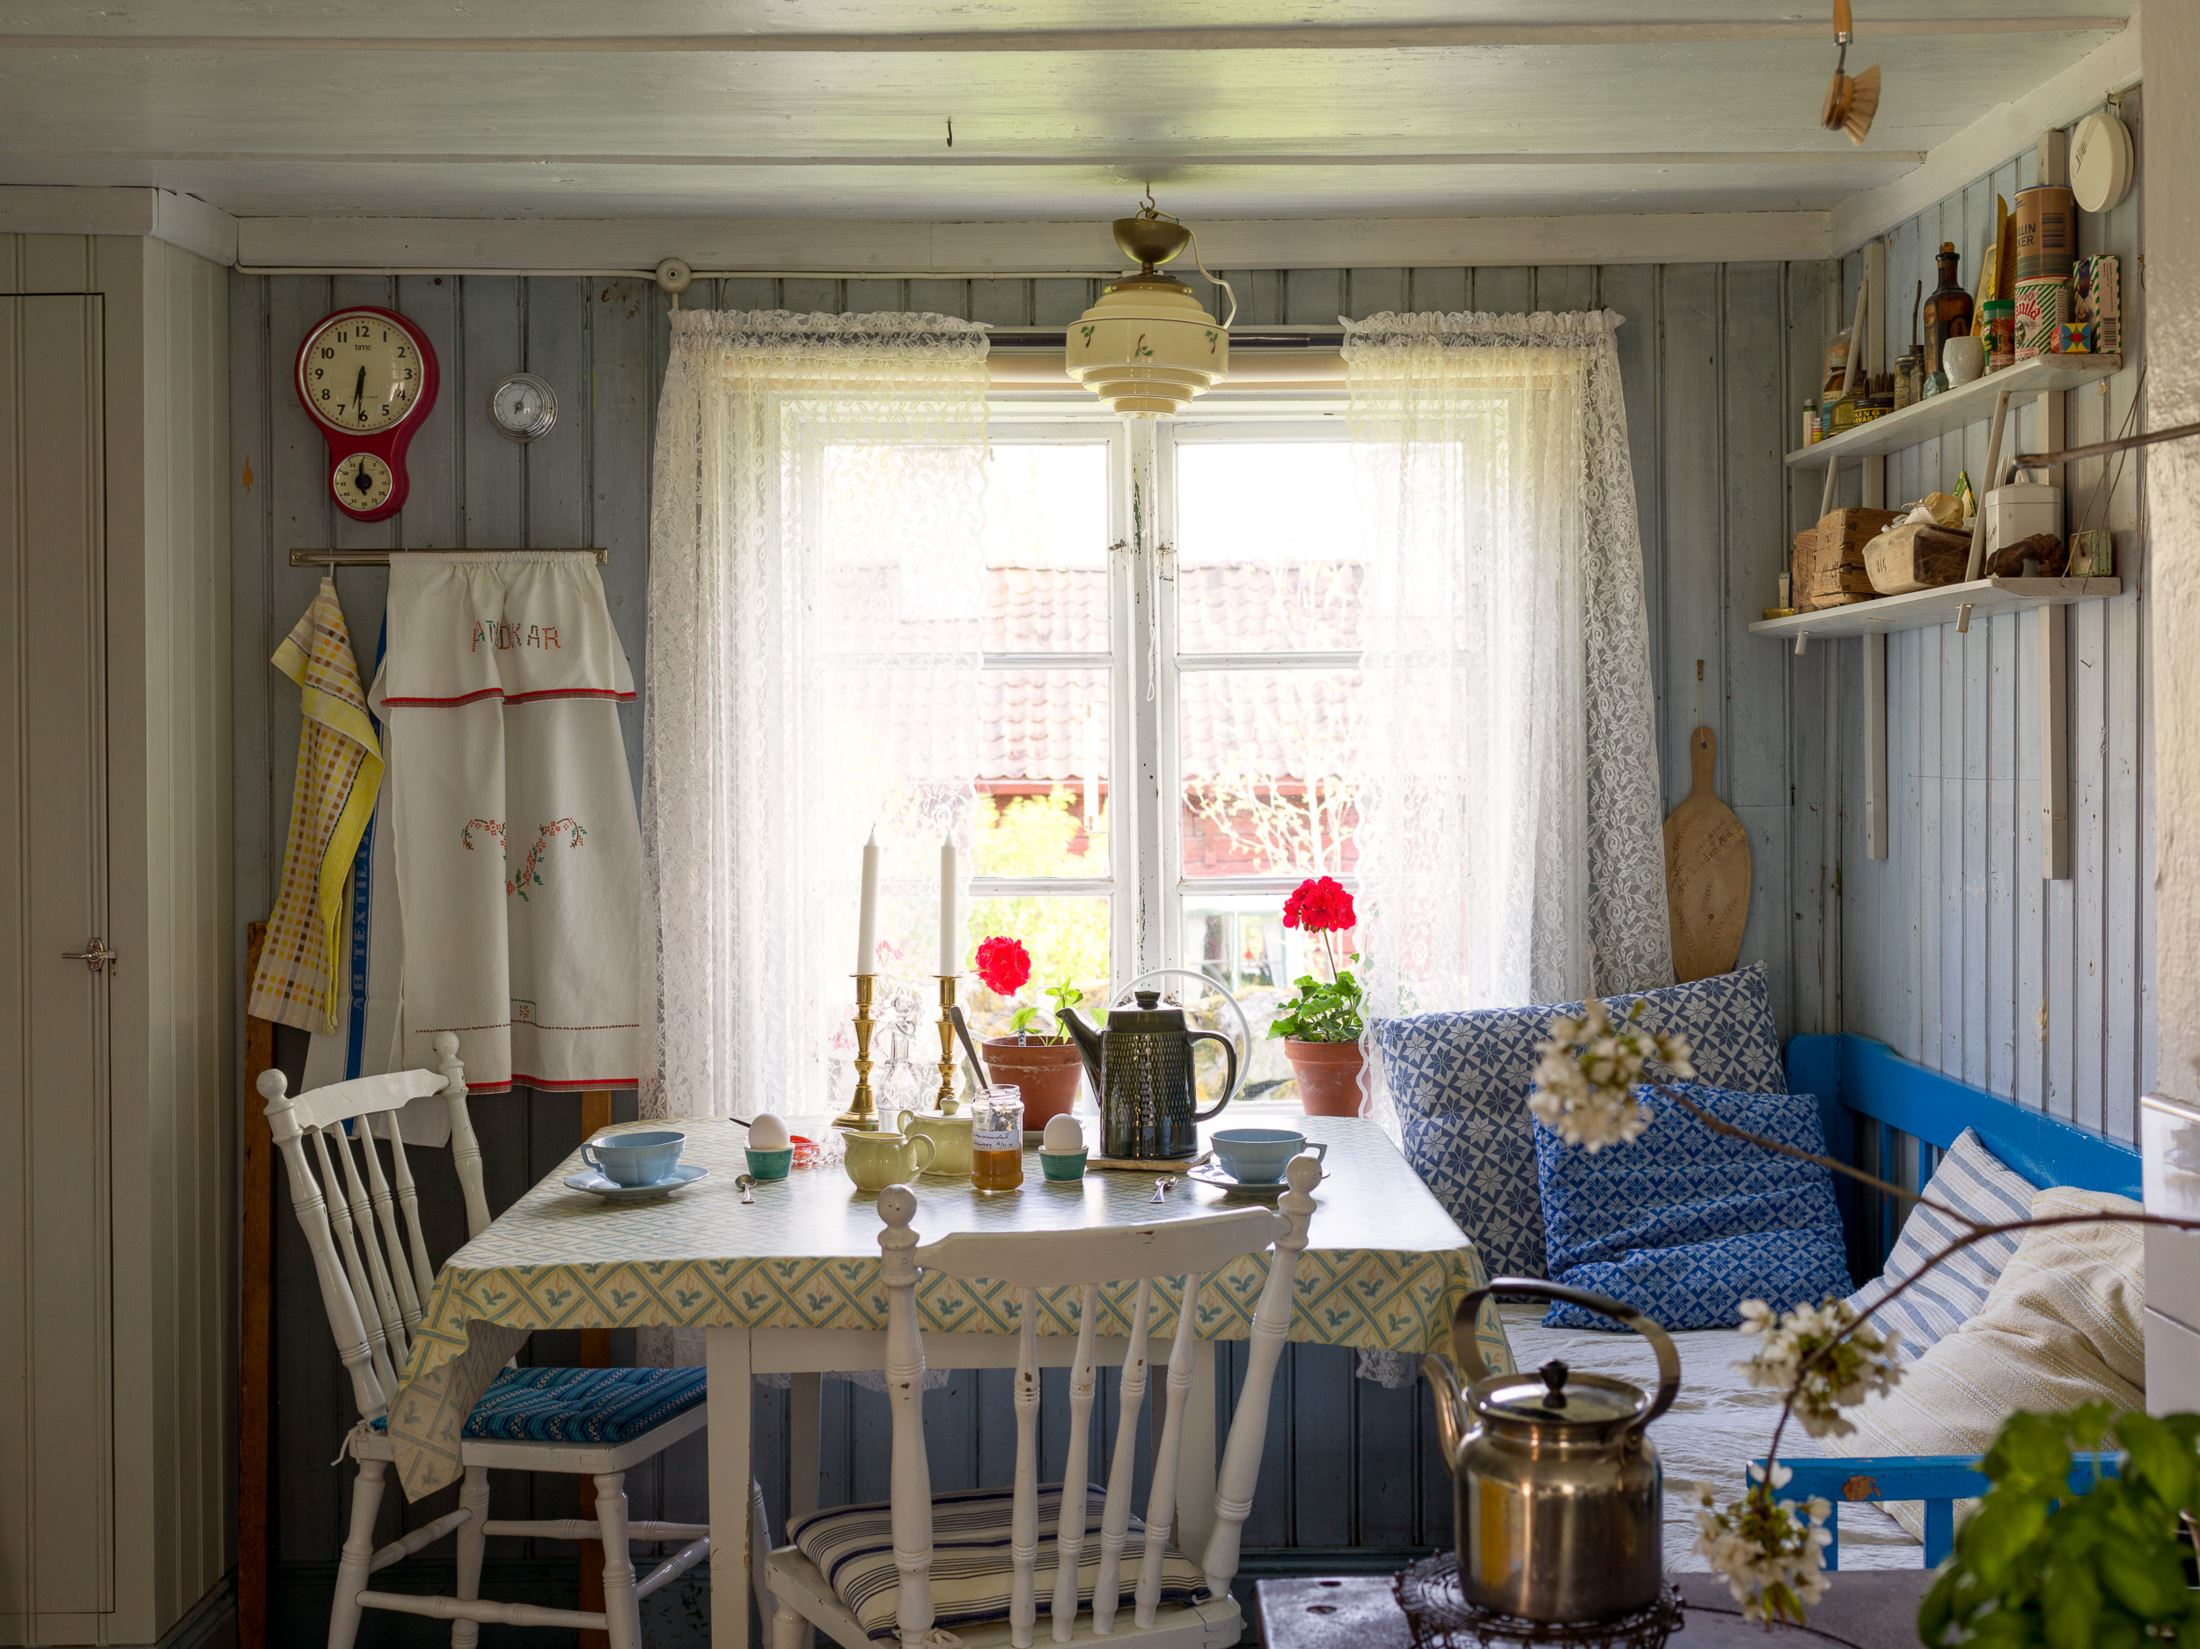 scandinavian-feeling-idyllic-swedish-cottage-hygge-1